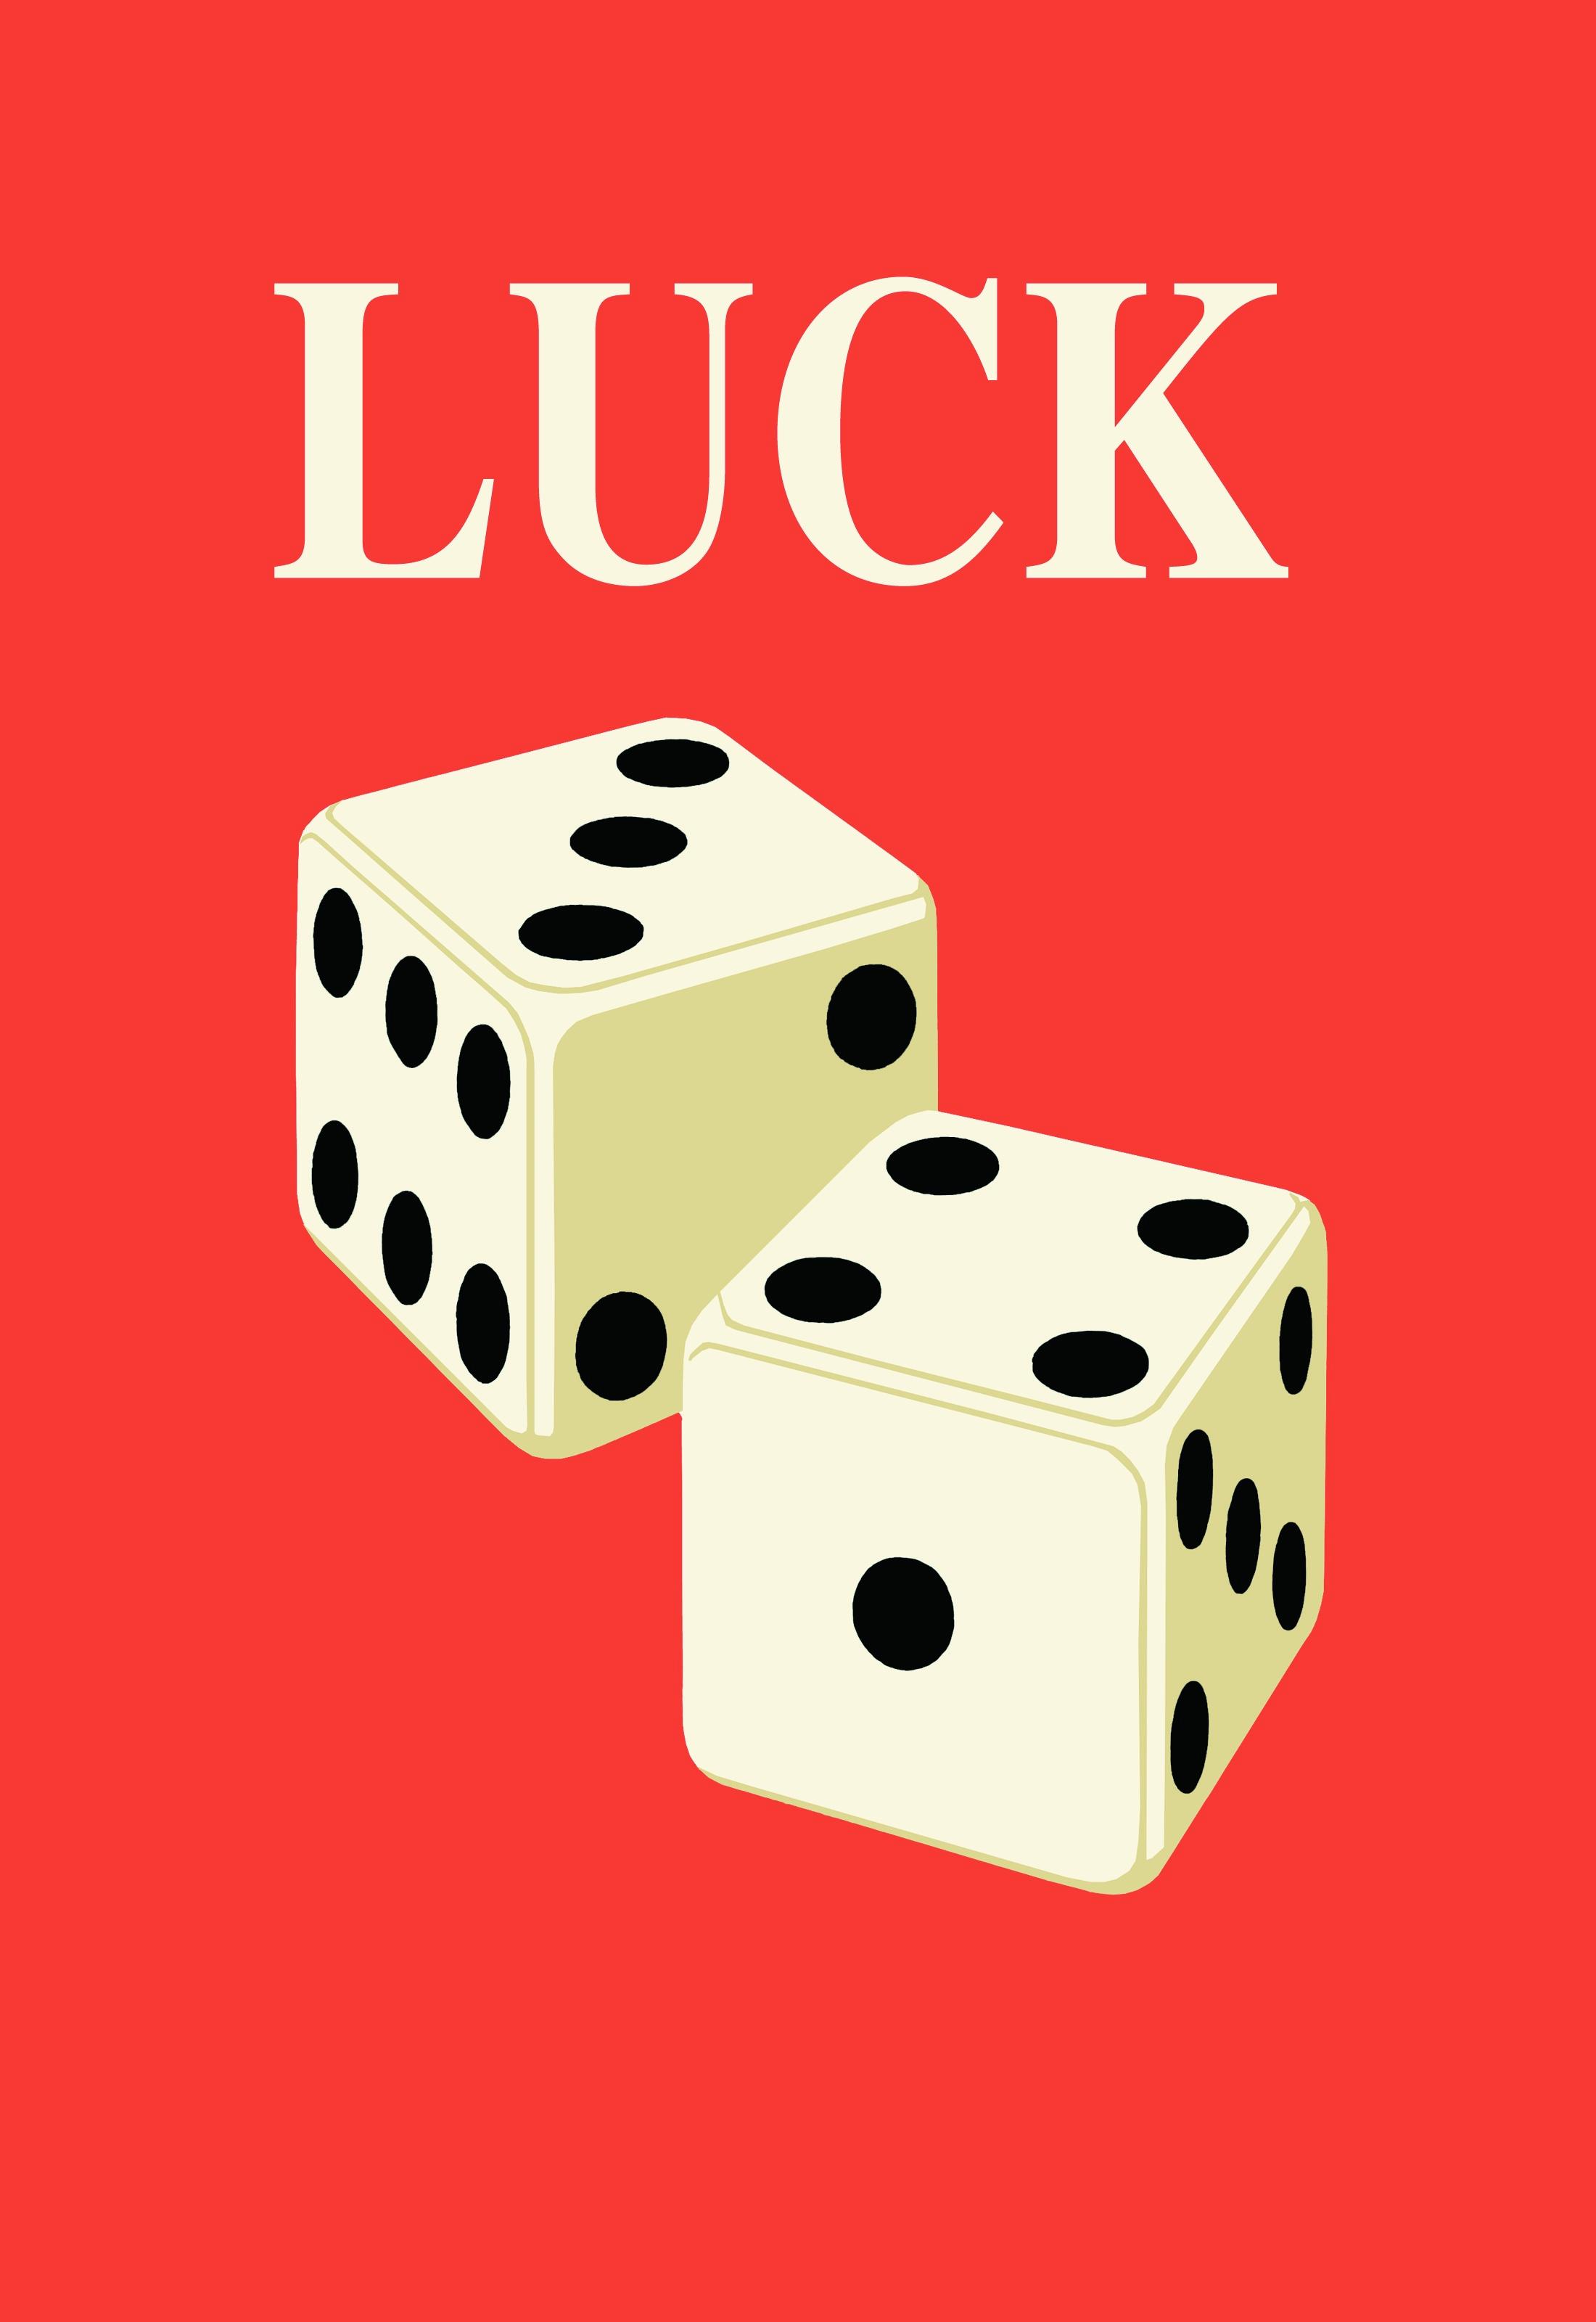 Luck: Dice